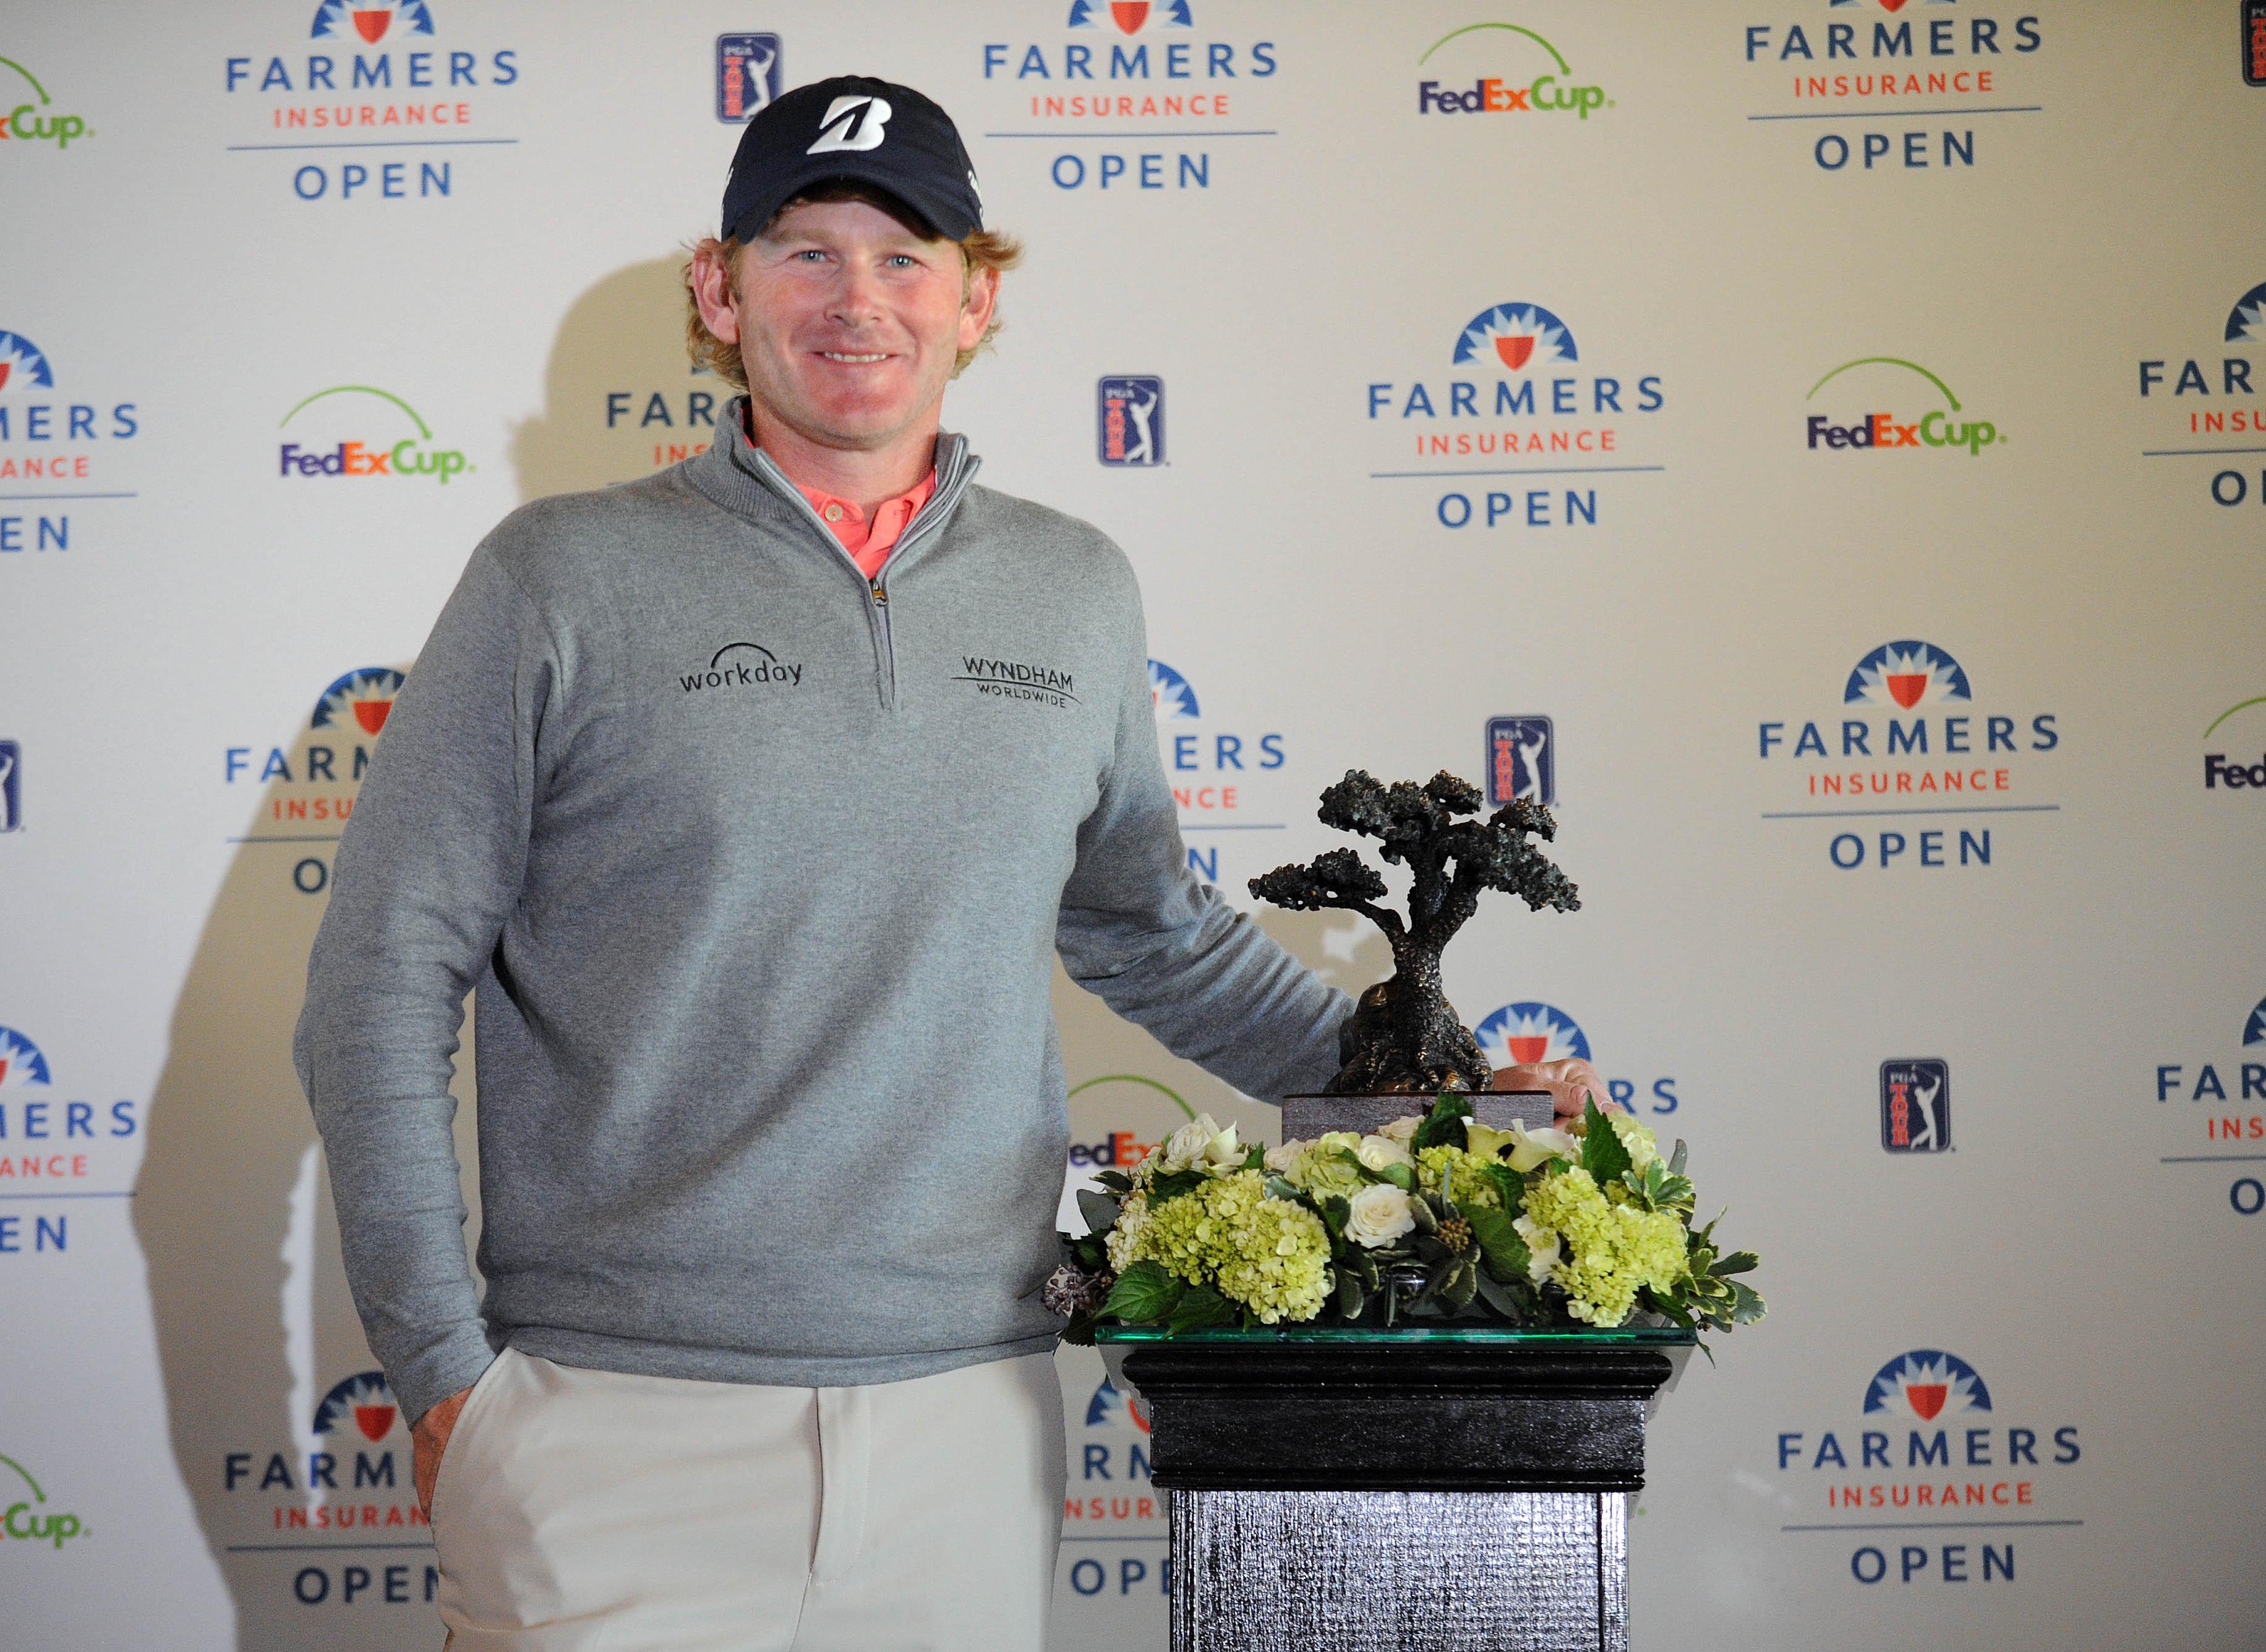 pga tour  farmers insurance open top 5 draftkings picks